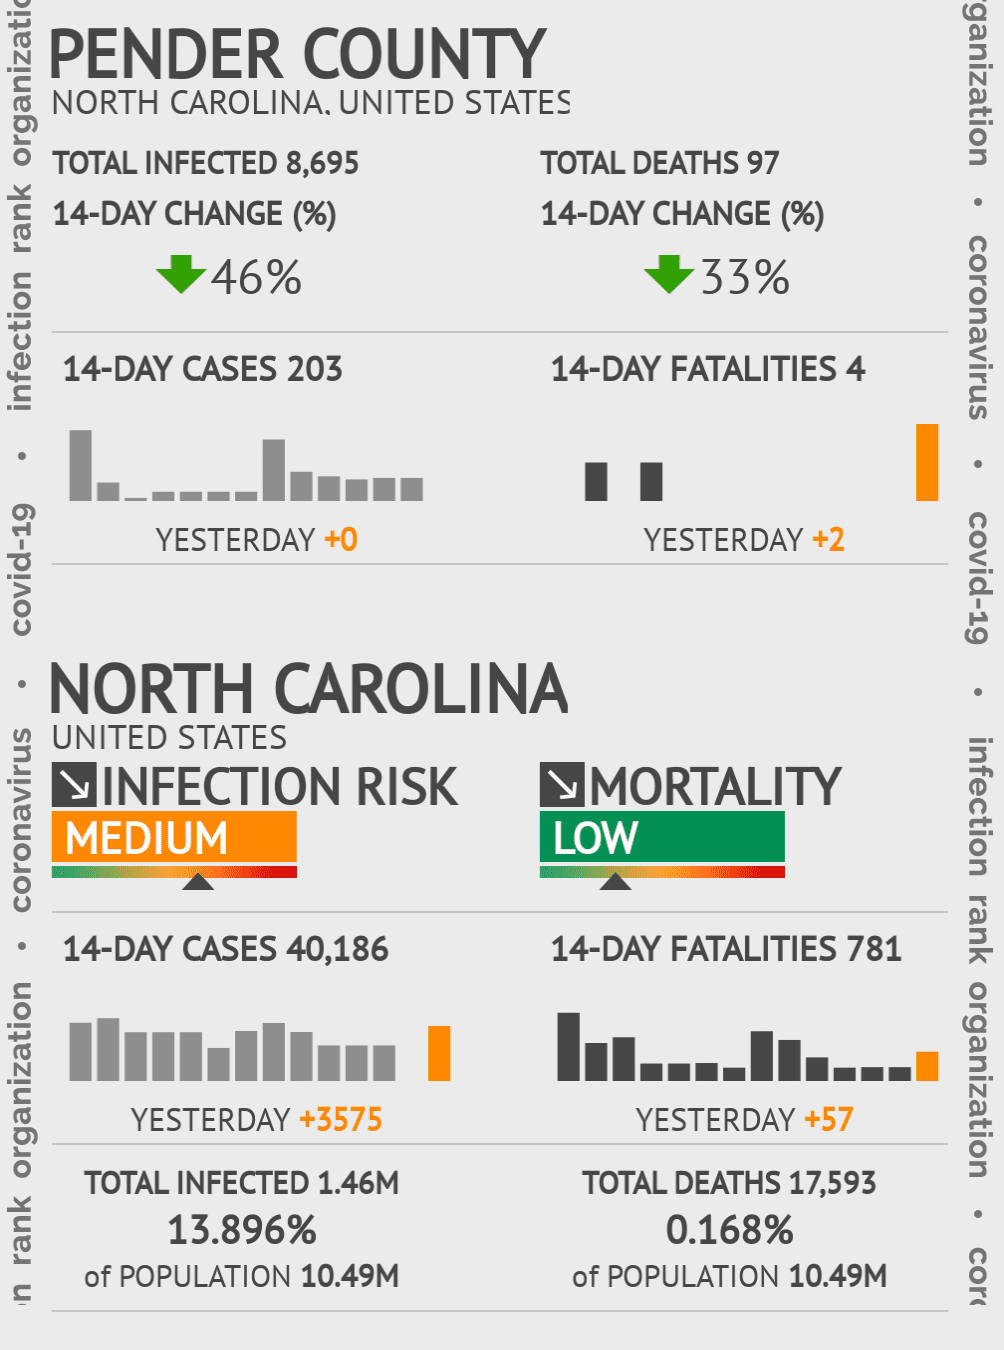 Pender County Coronavirus Covid-19 Risk of Infection on November 30, 2020